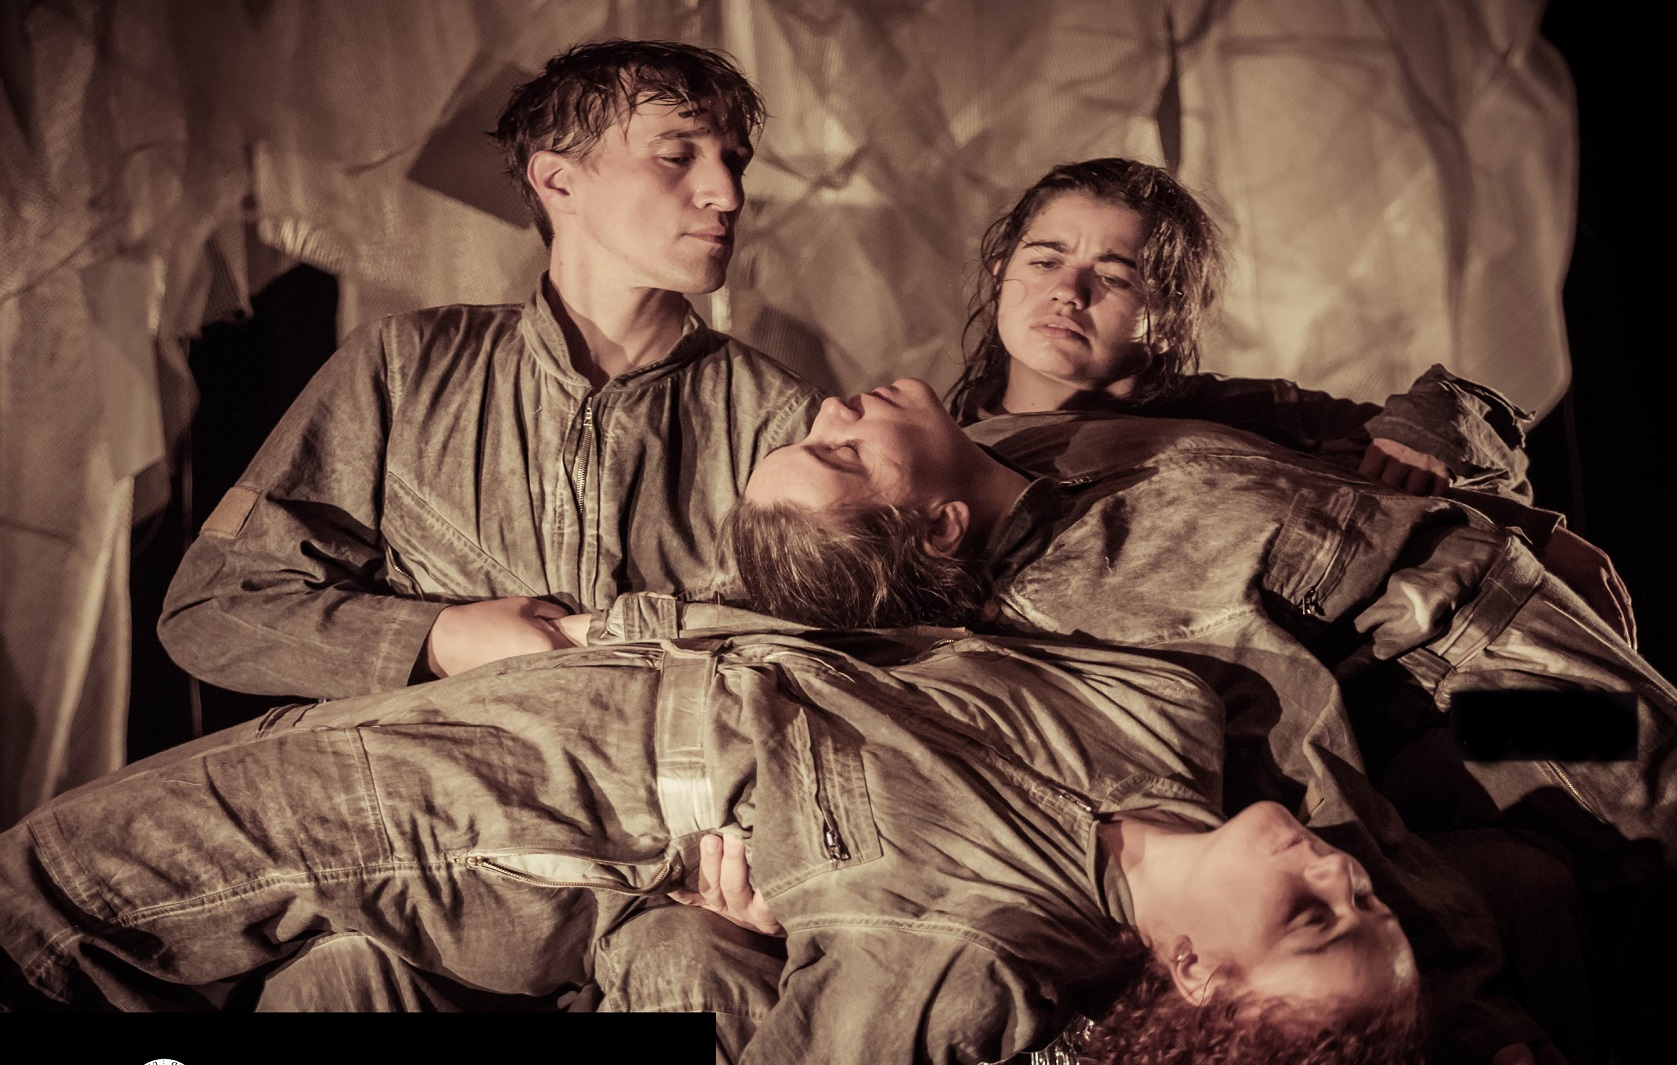 'The room to be', de Burka Teatro